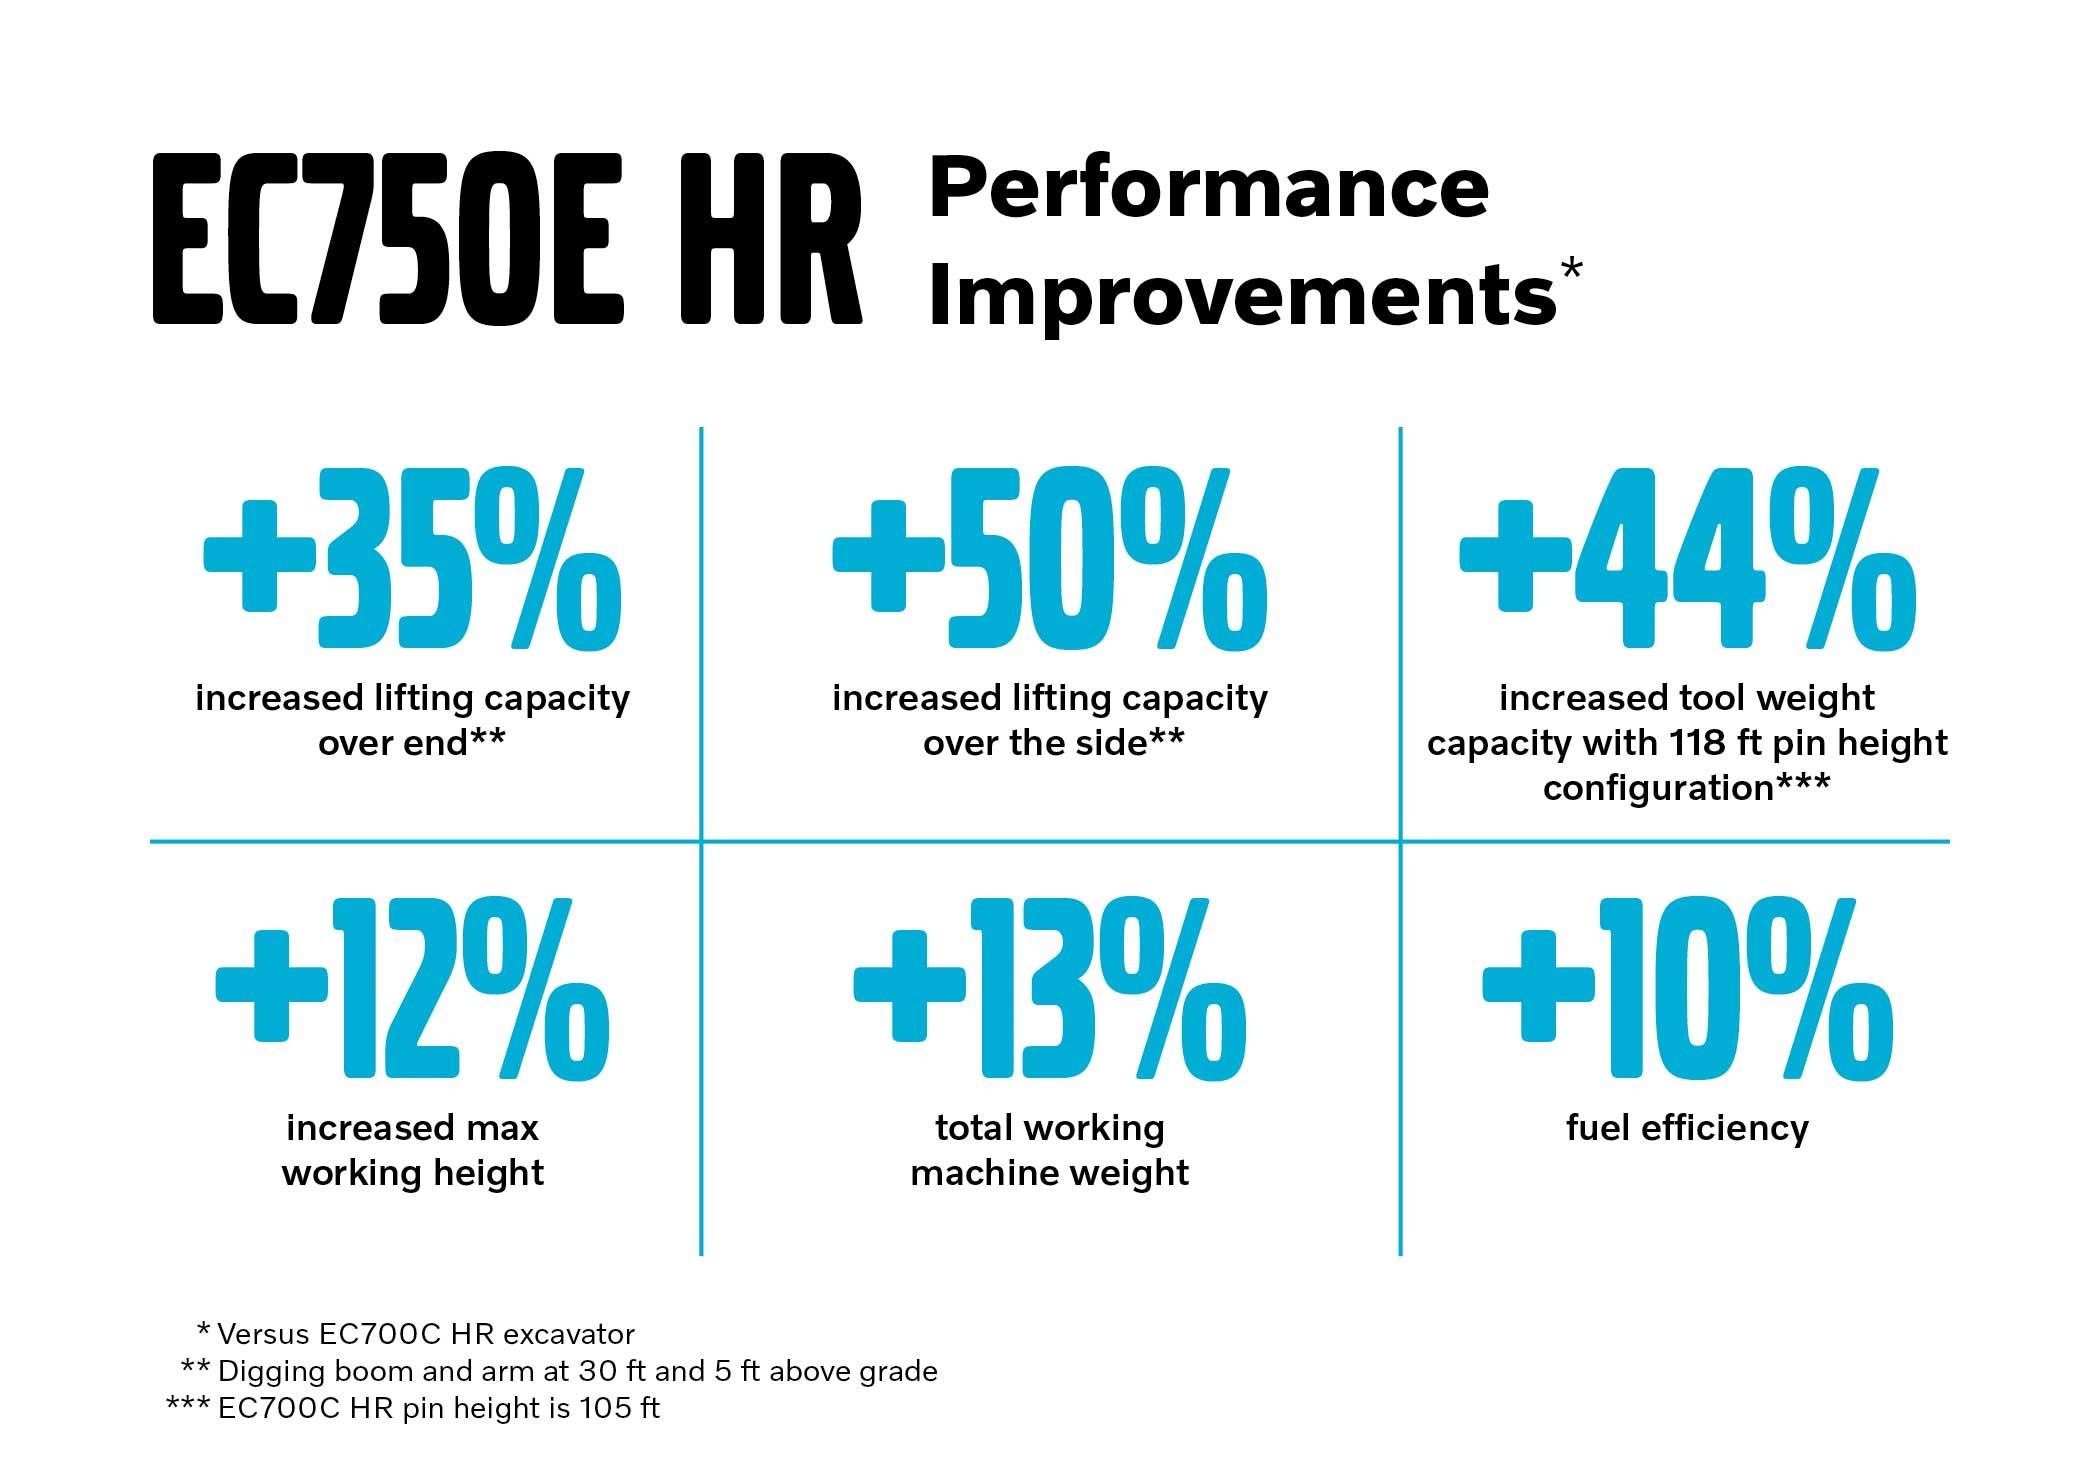 Lifting capacity is 35 percent more than the Volvo EC700C HR excavator